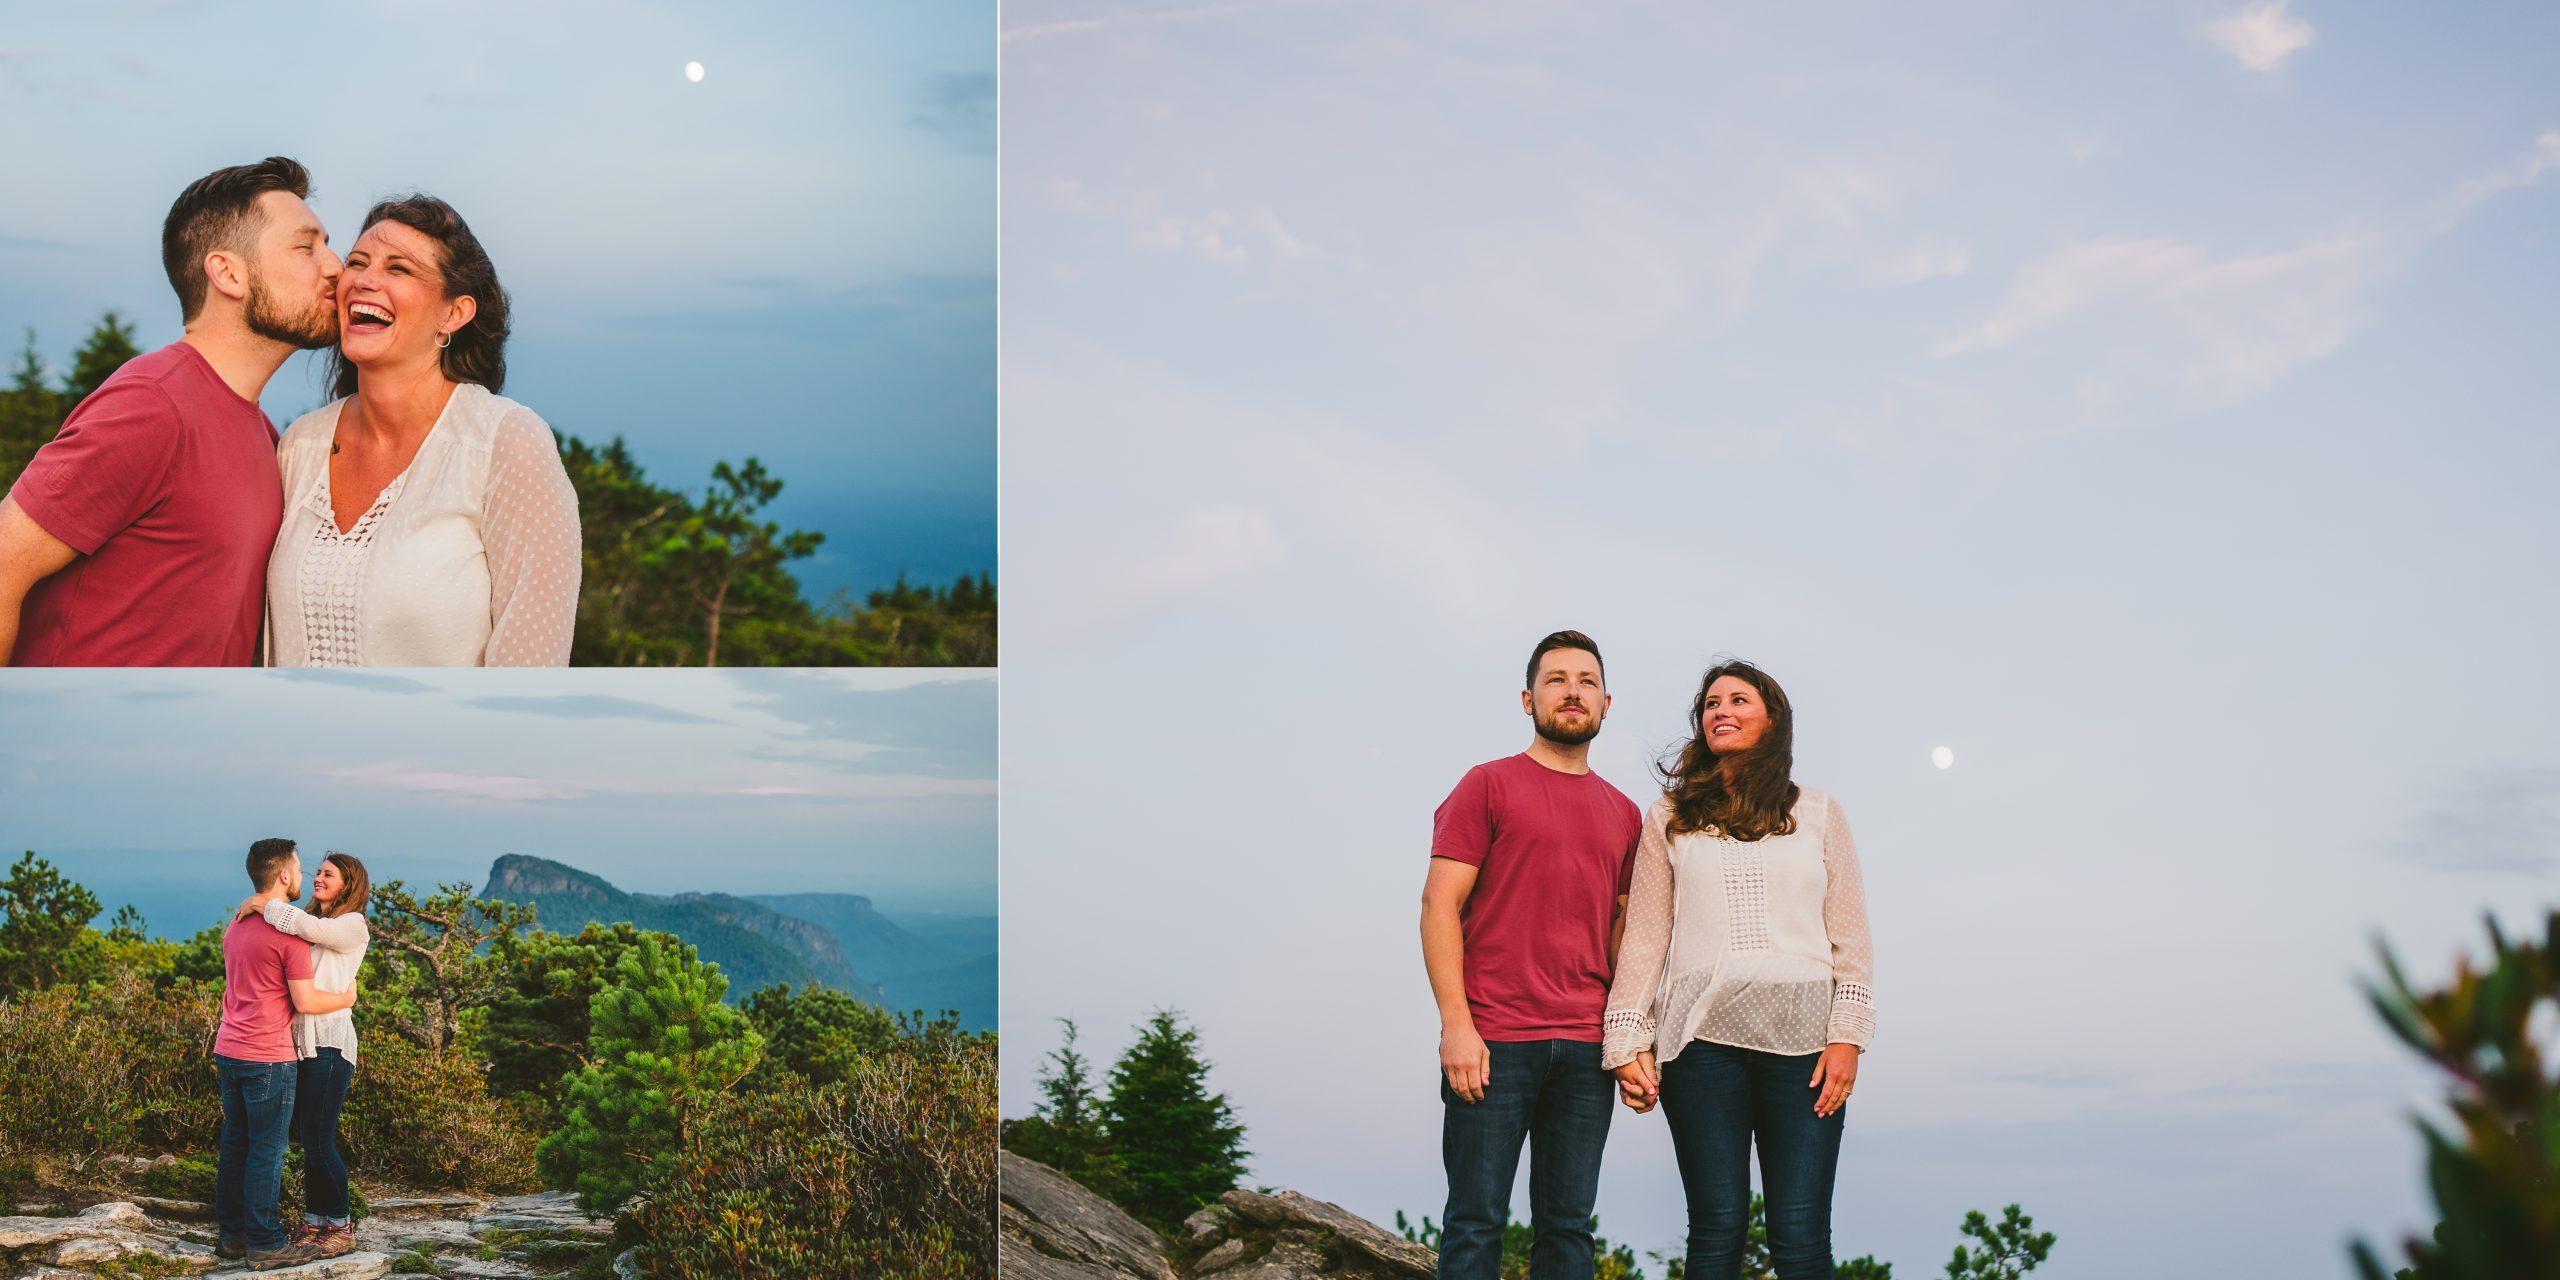 Couple having fun during adventurous mountain engagement session